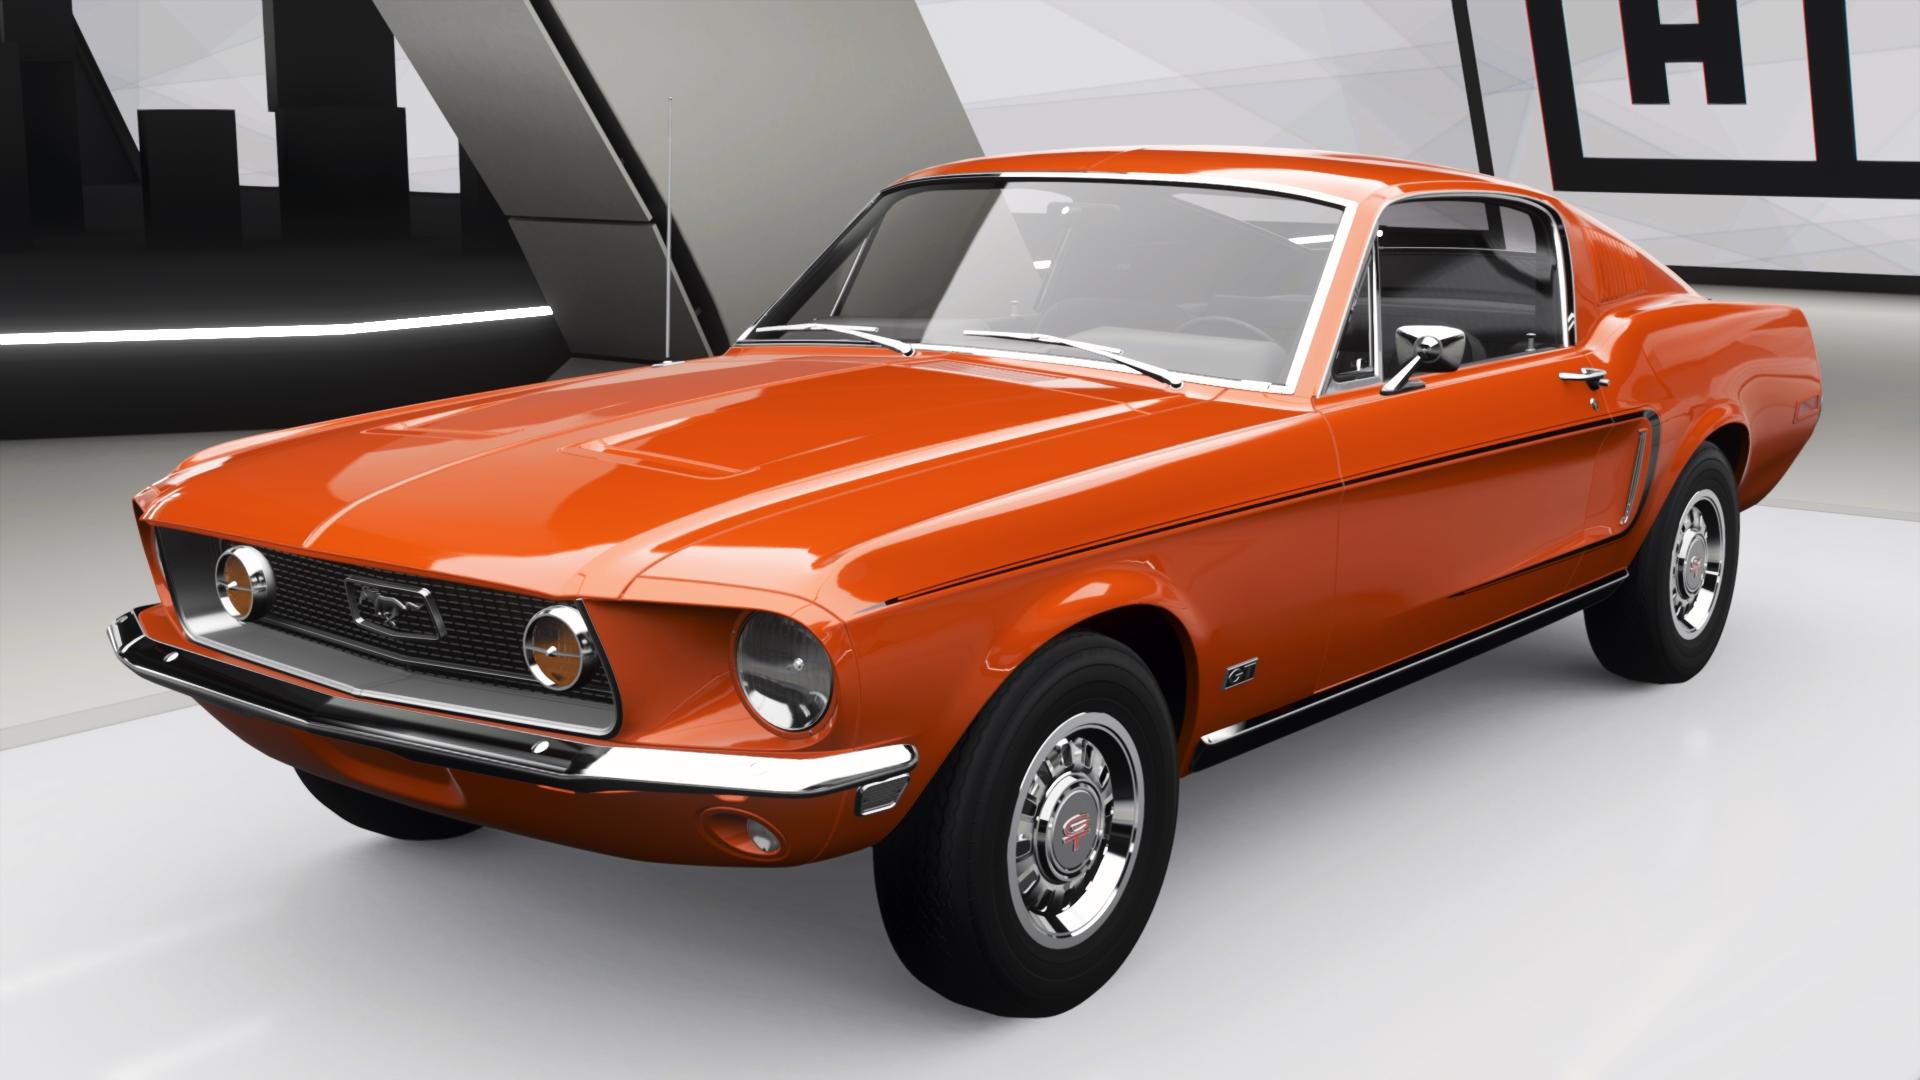 68 Fastback Mustang >> Ford Mustang 2 2 Fastback Forza Motorsport Wiki Fandom